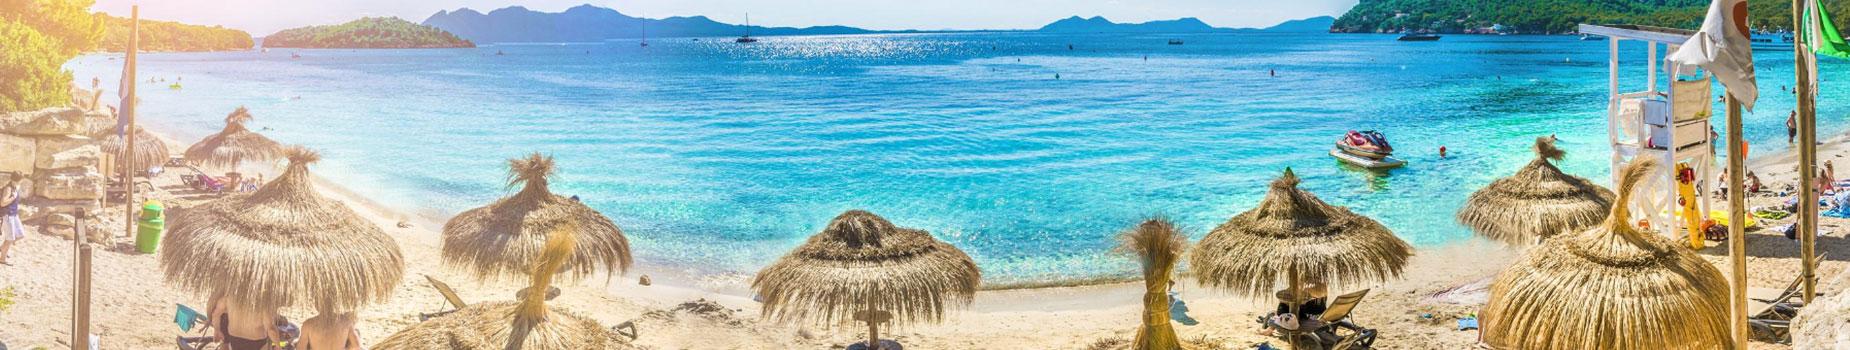 Kindvriendelijke hotels Mallorca